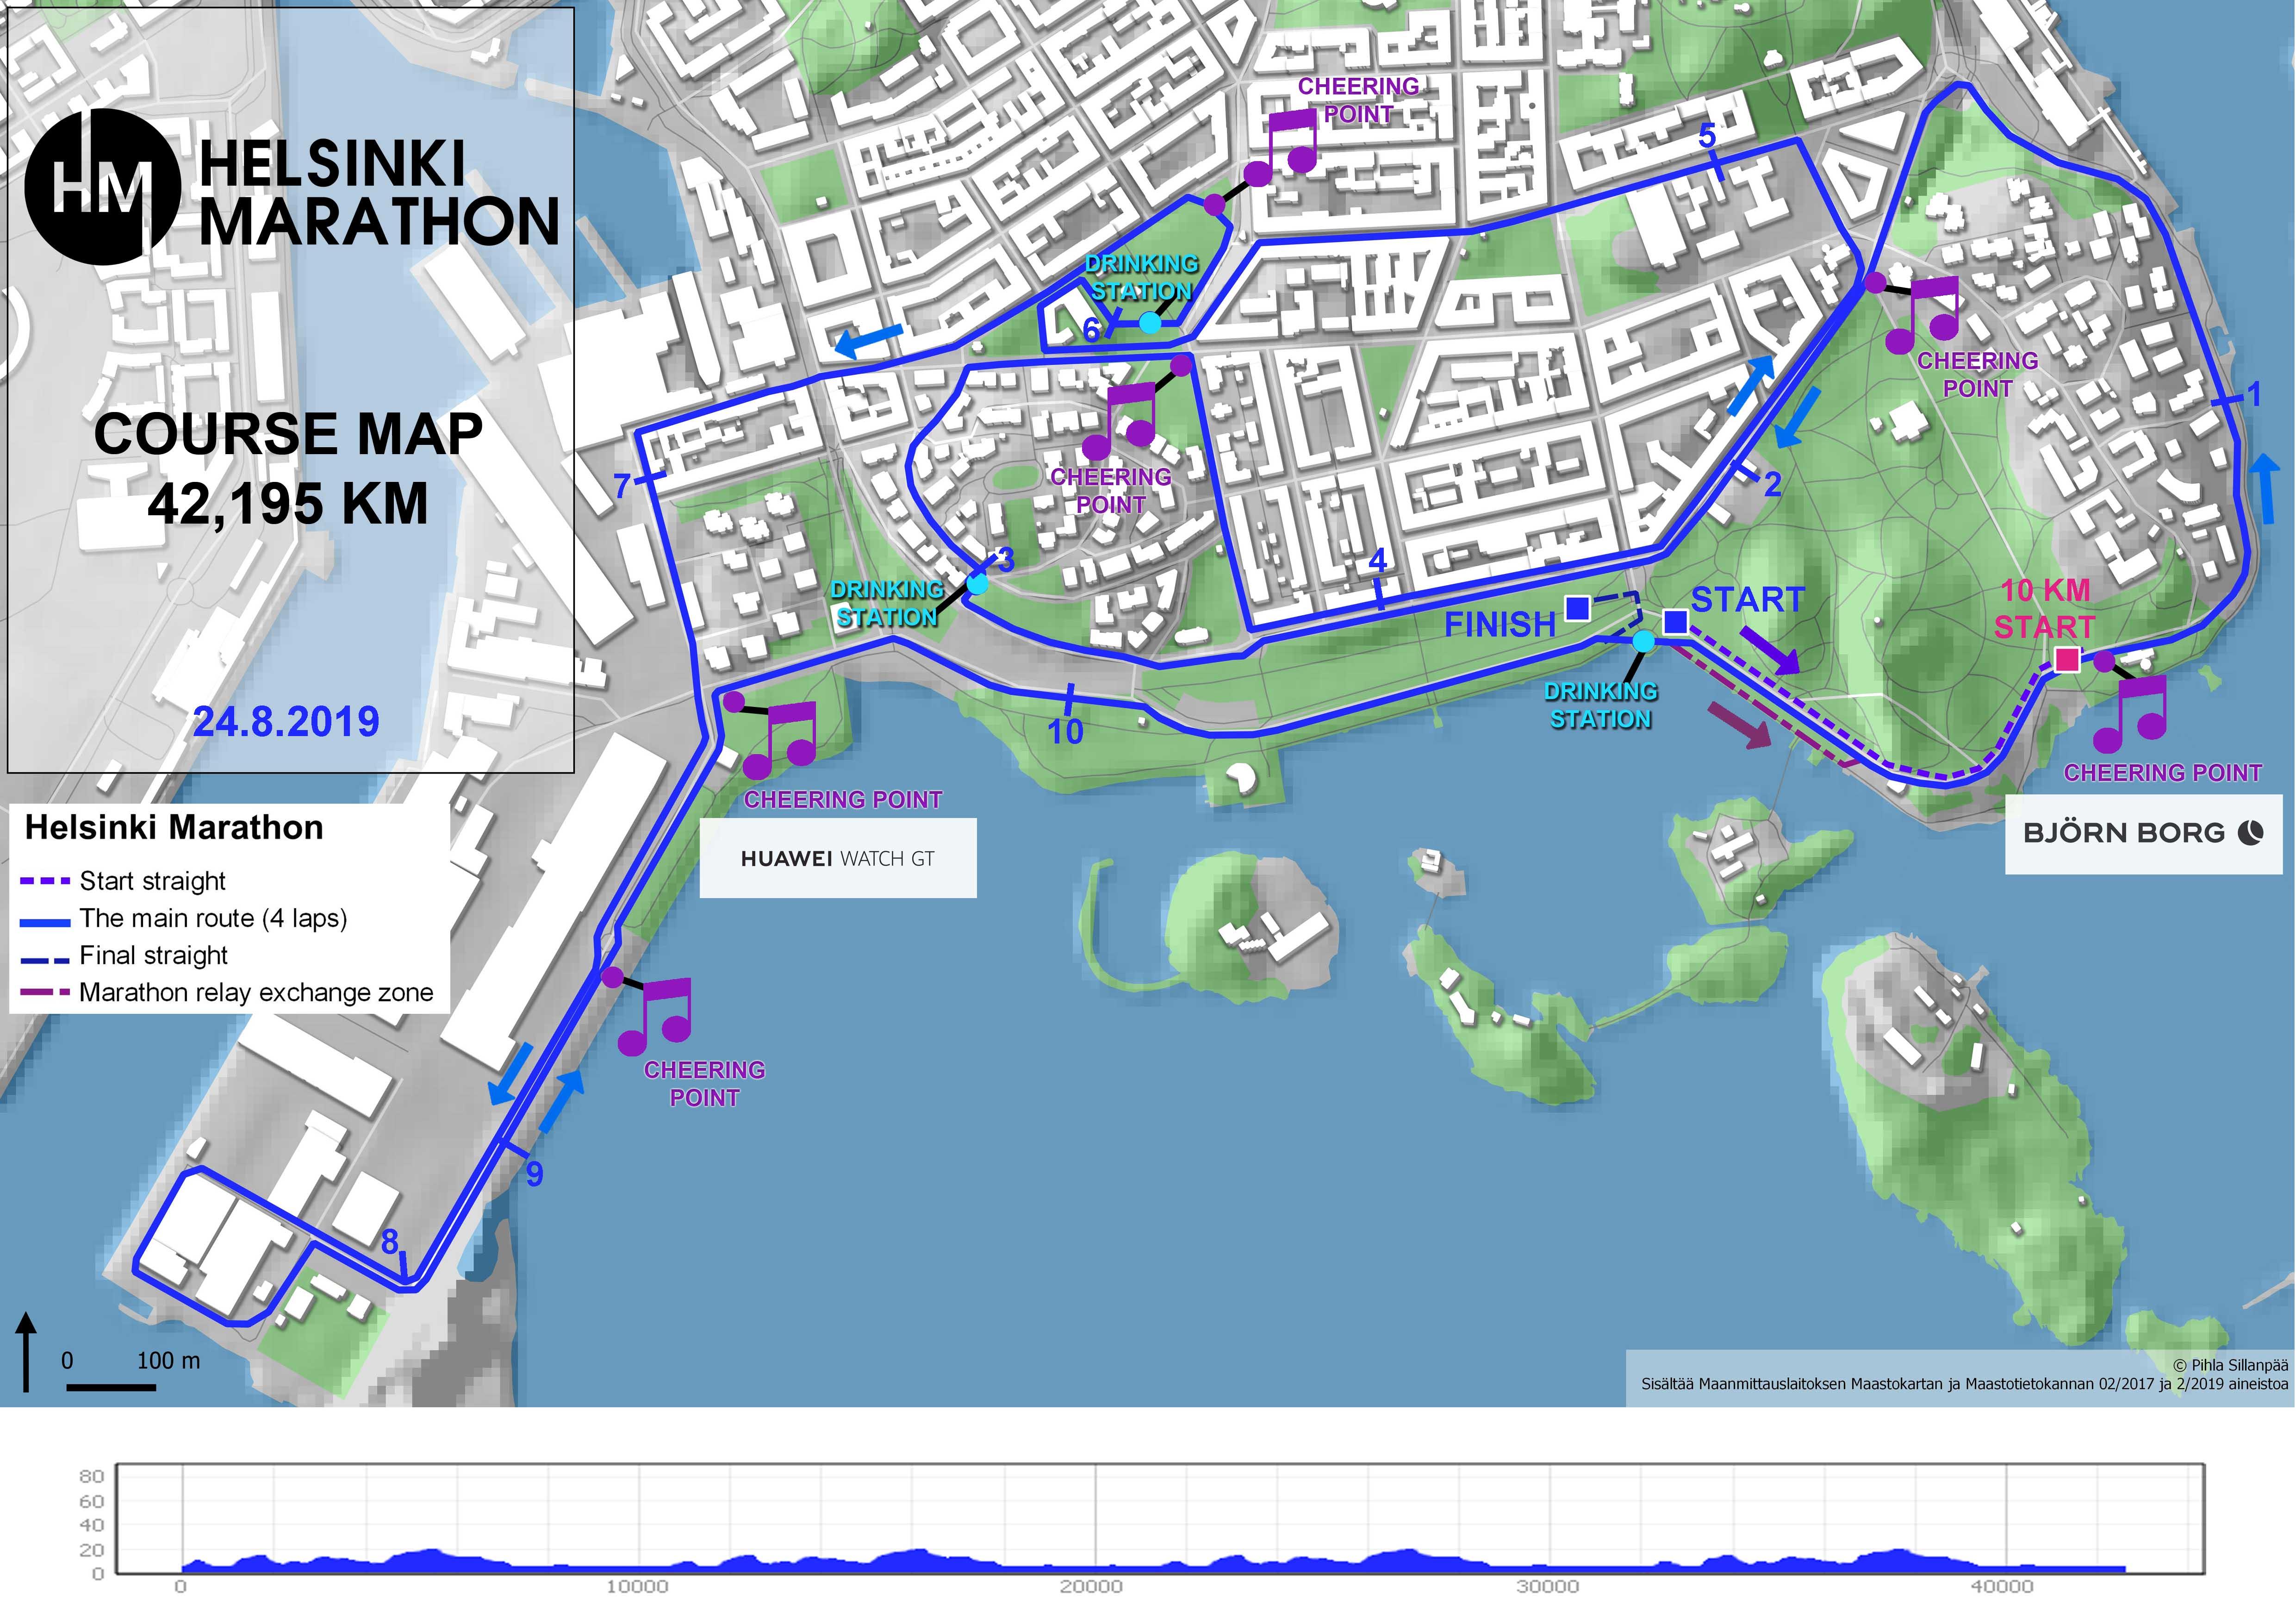 Route Helsinki Marathon